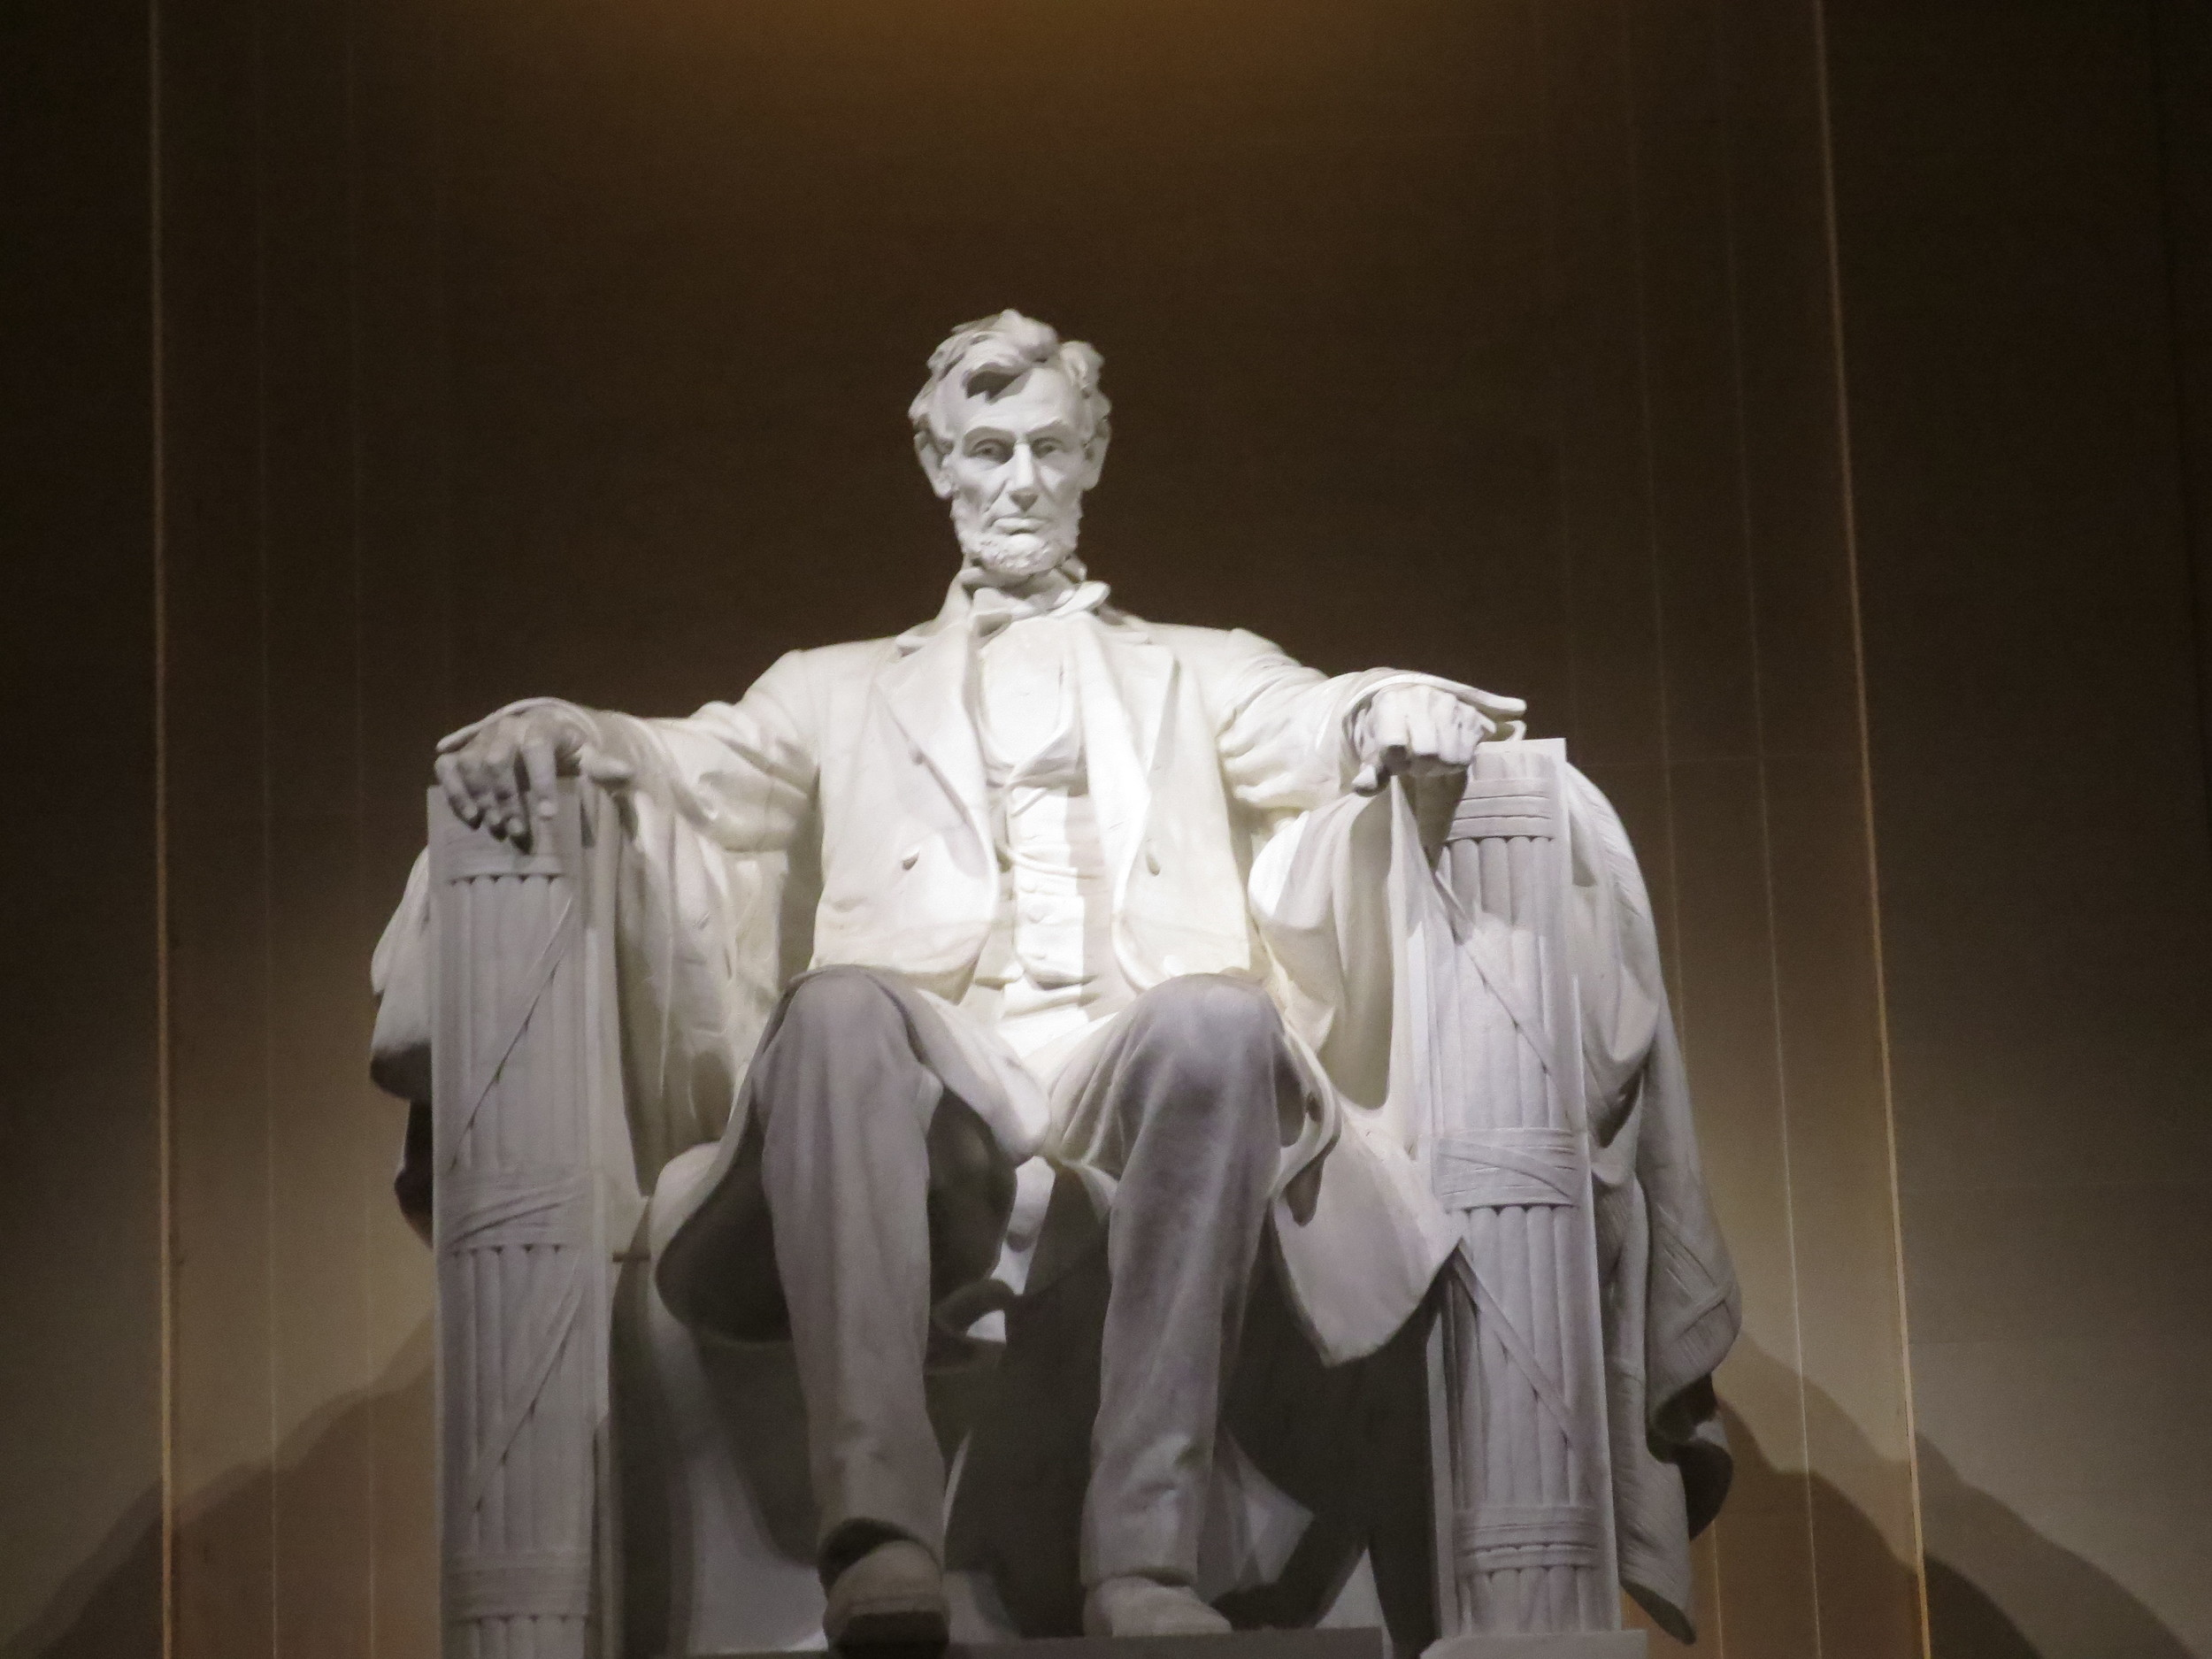 Mr. Lincoln himself